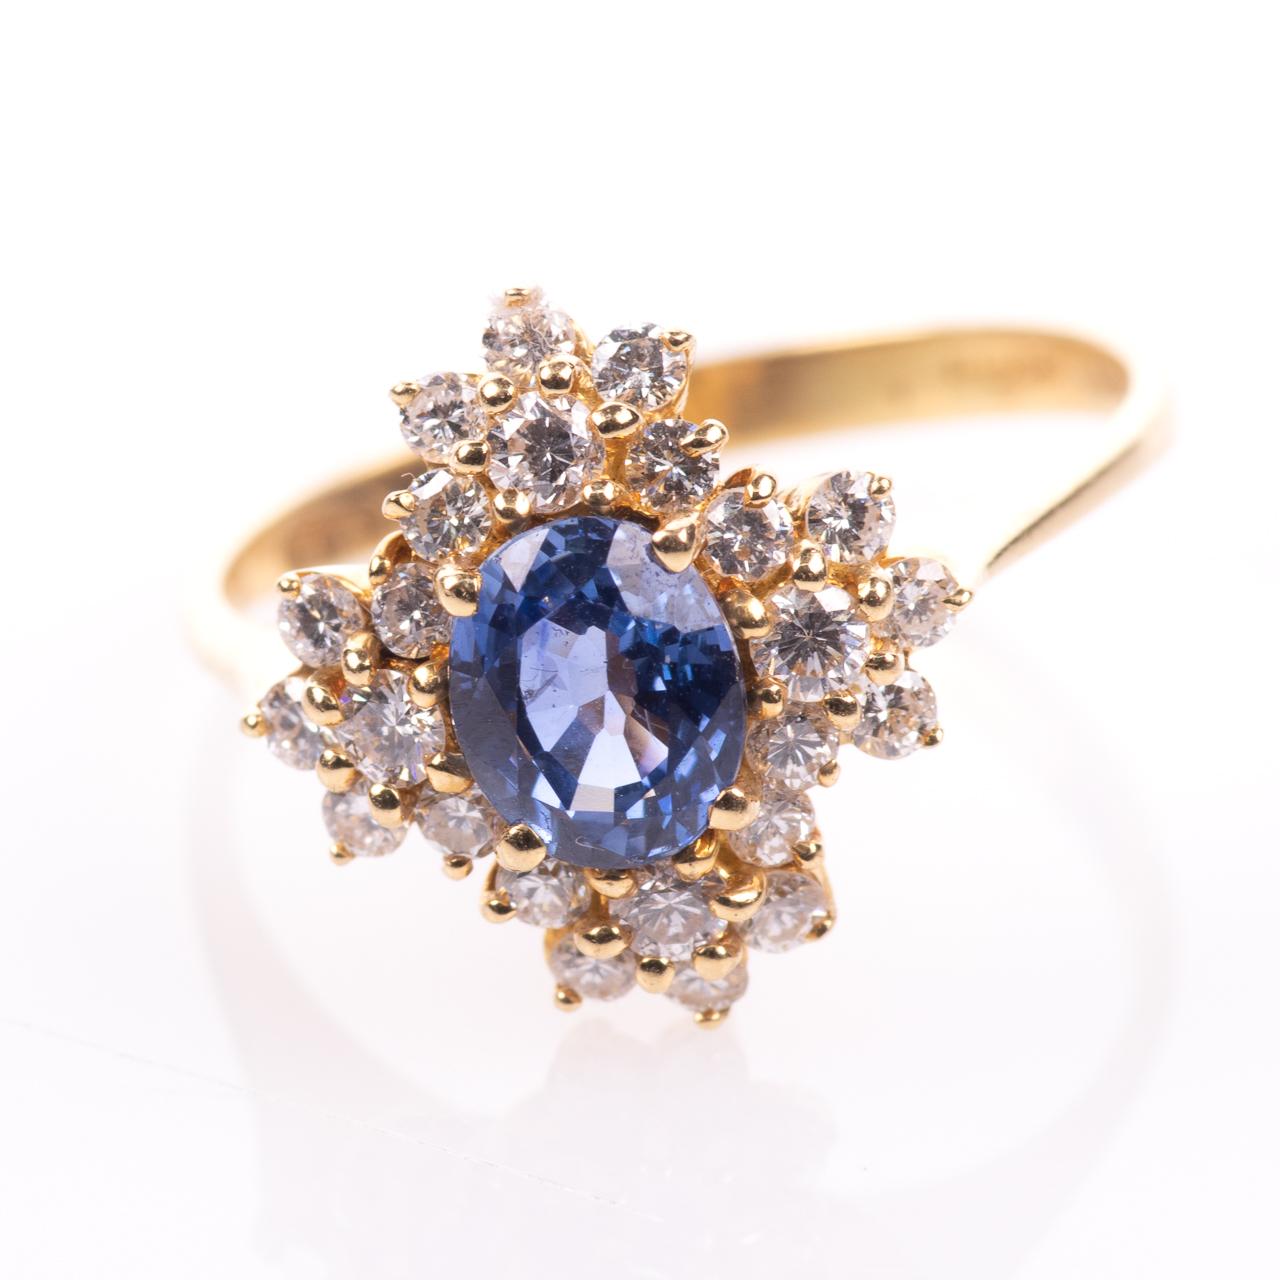 18ct Gold 1ct Sapphire & 0.70ct Diamond Ring